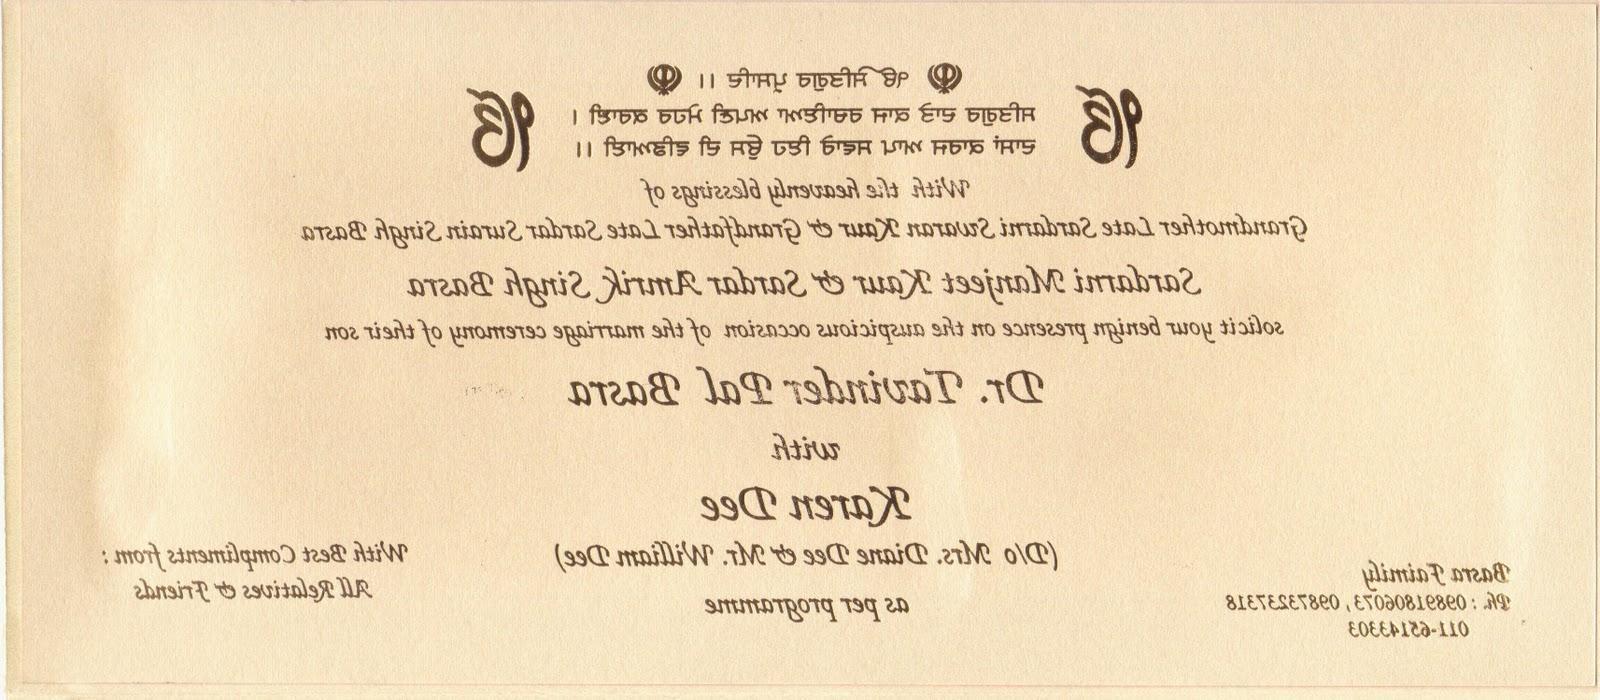 Wedding Invitation In Hindi: Wedding Invitation Cards In Hindi